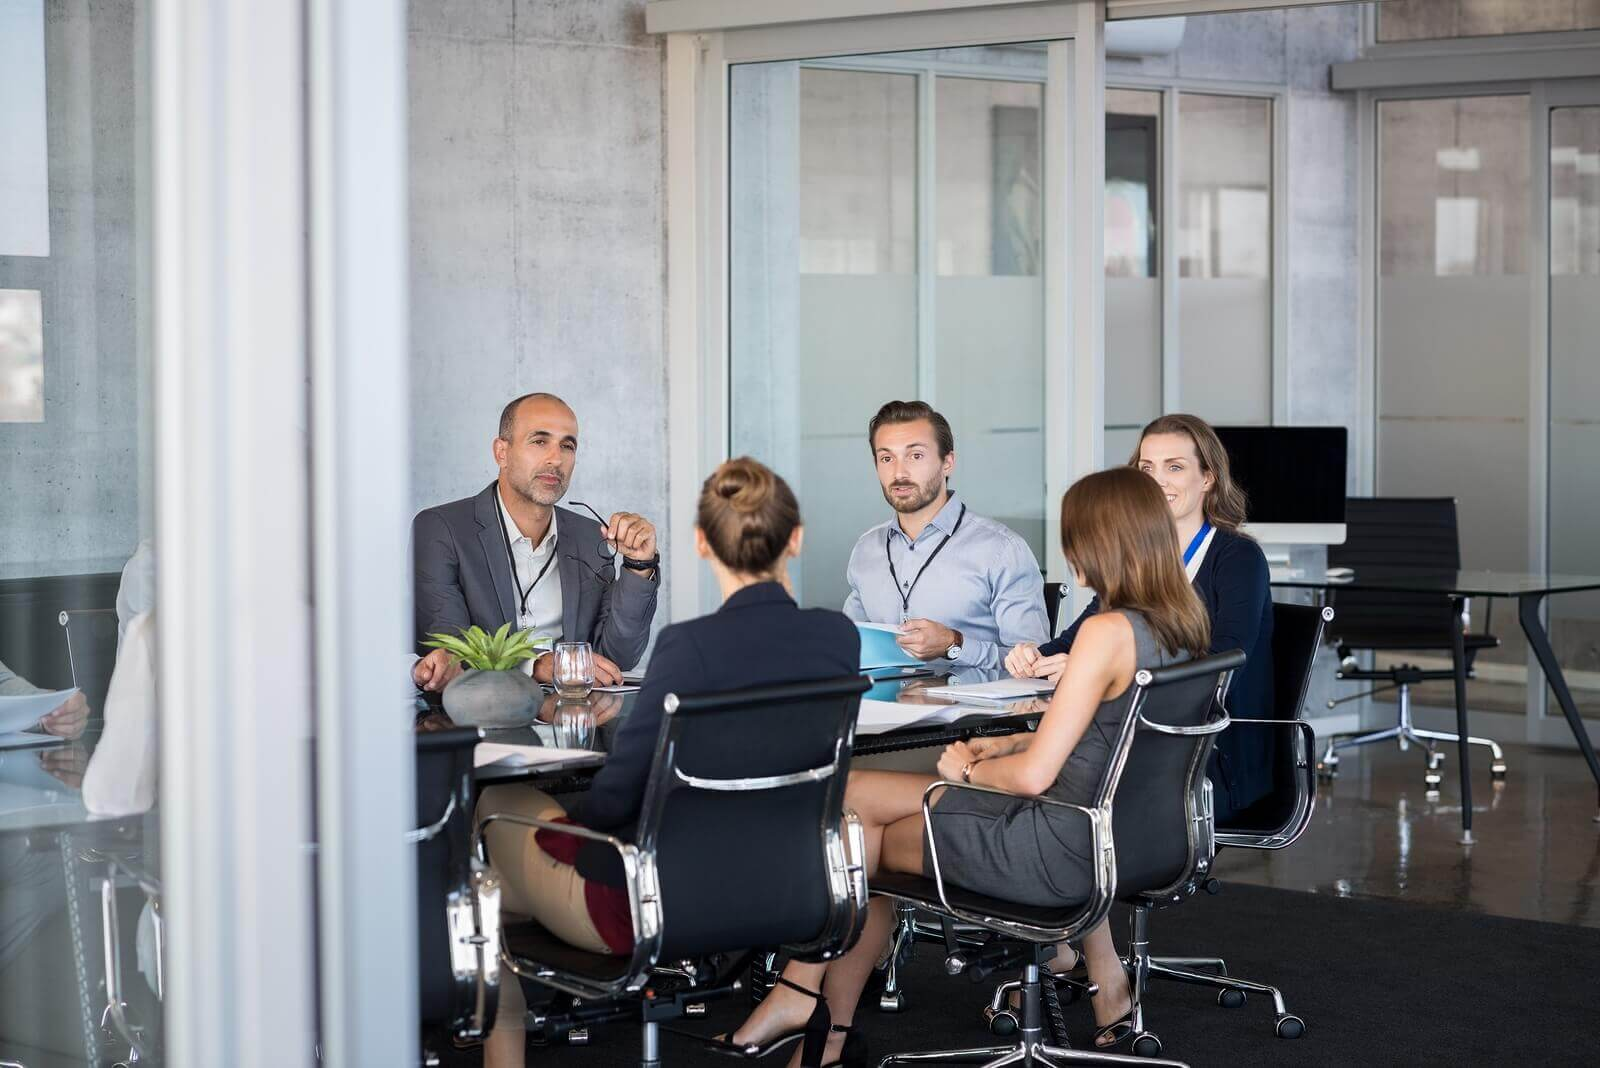 bigstock-Business-people-sitting-in-boa-206016238